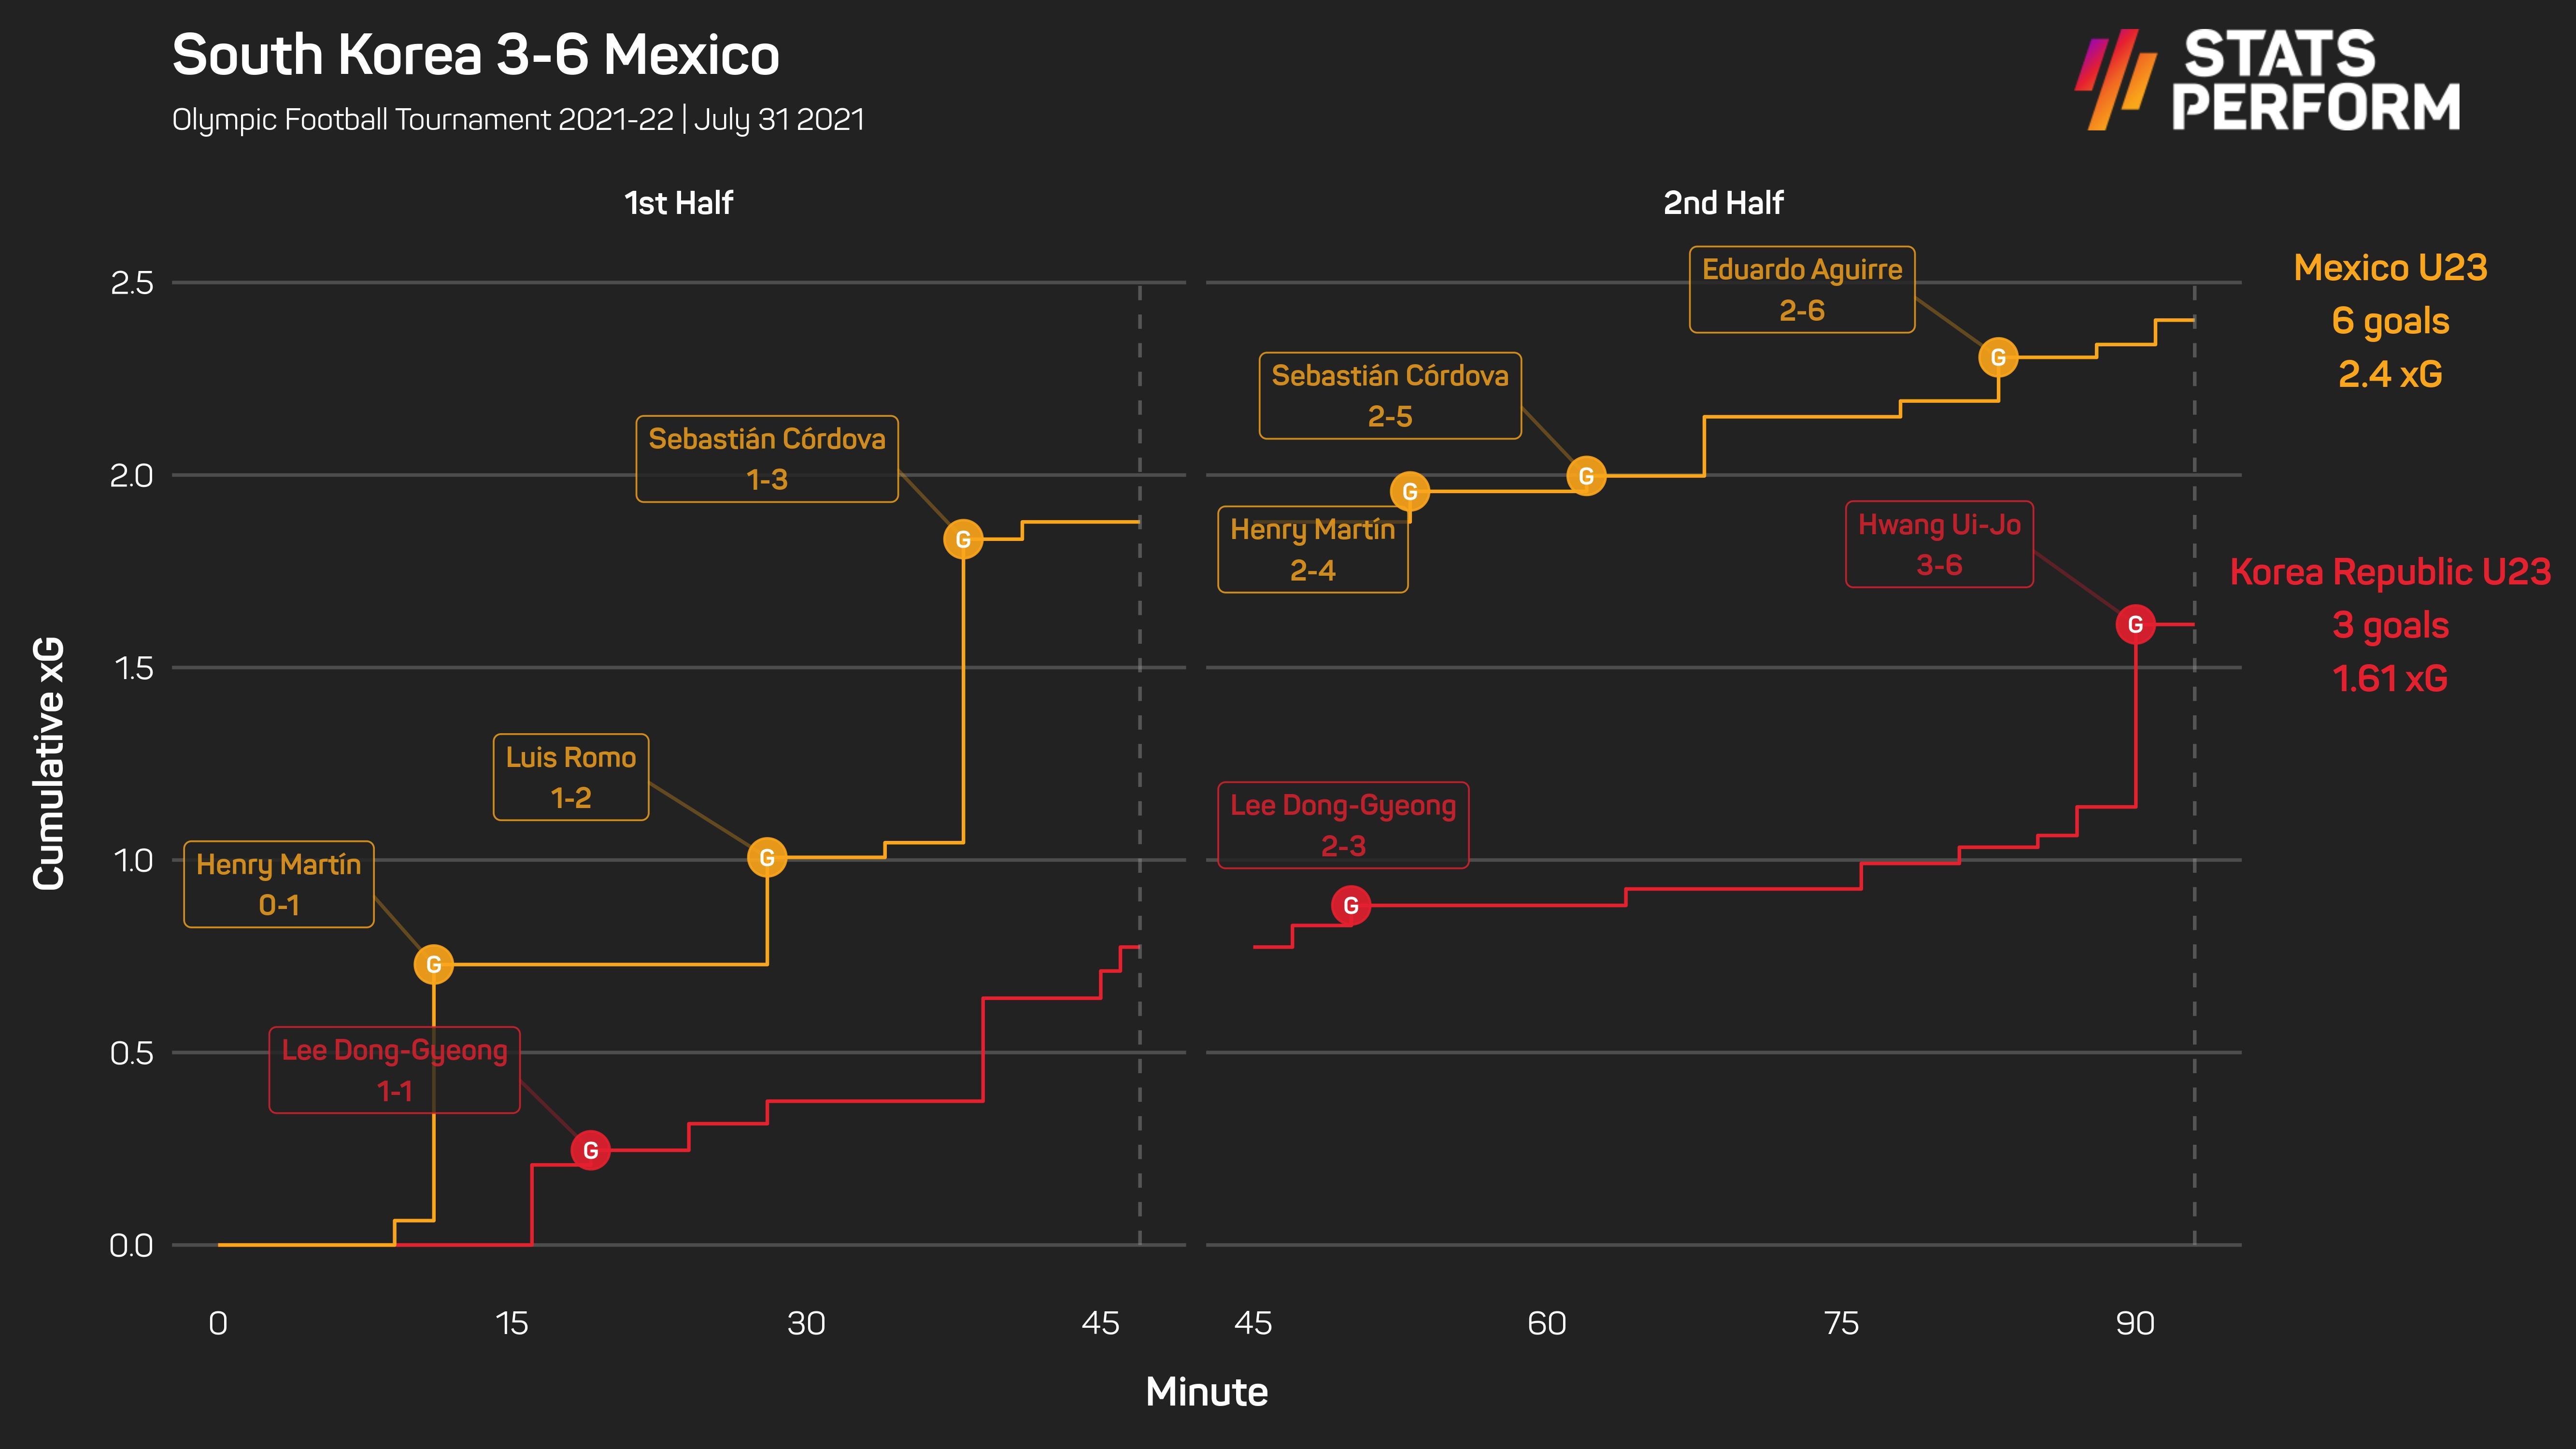 South Korea 3-6 Mexico xG race